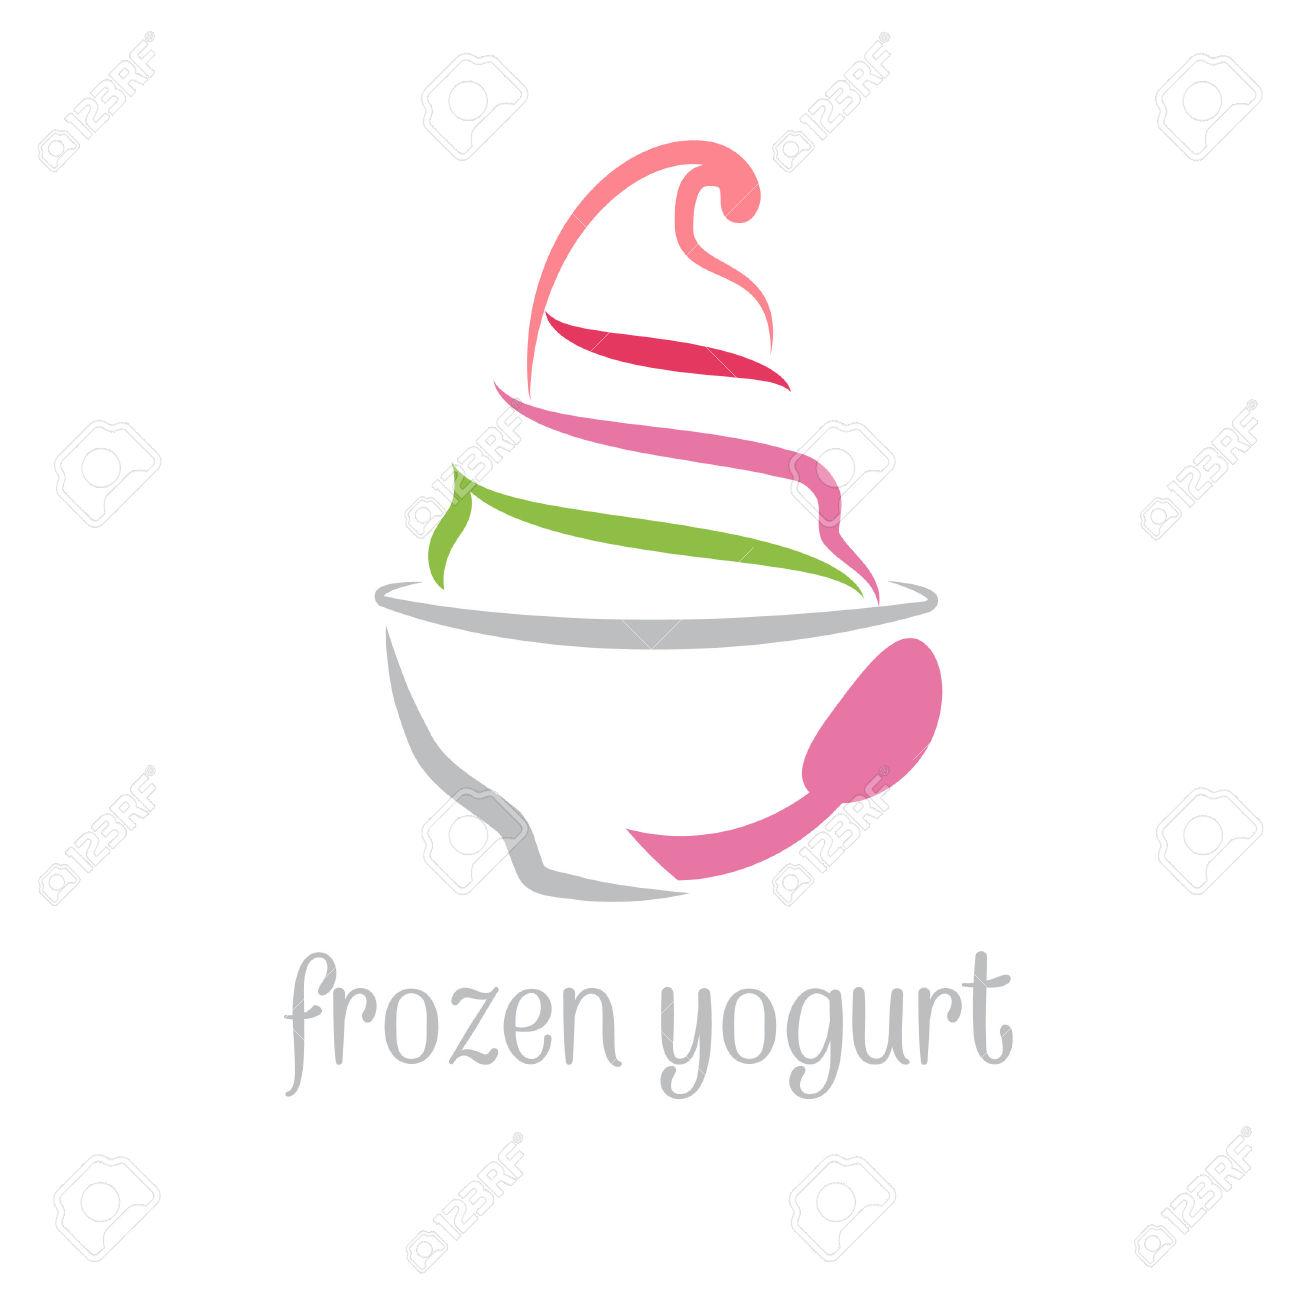 835 Frozen Yogurt Fruit Stock Illustrations, Cliparts And Royalty.